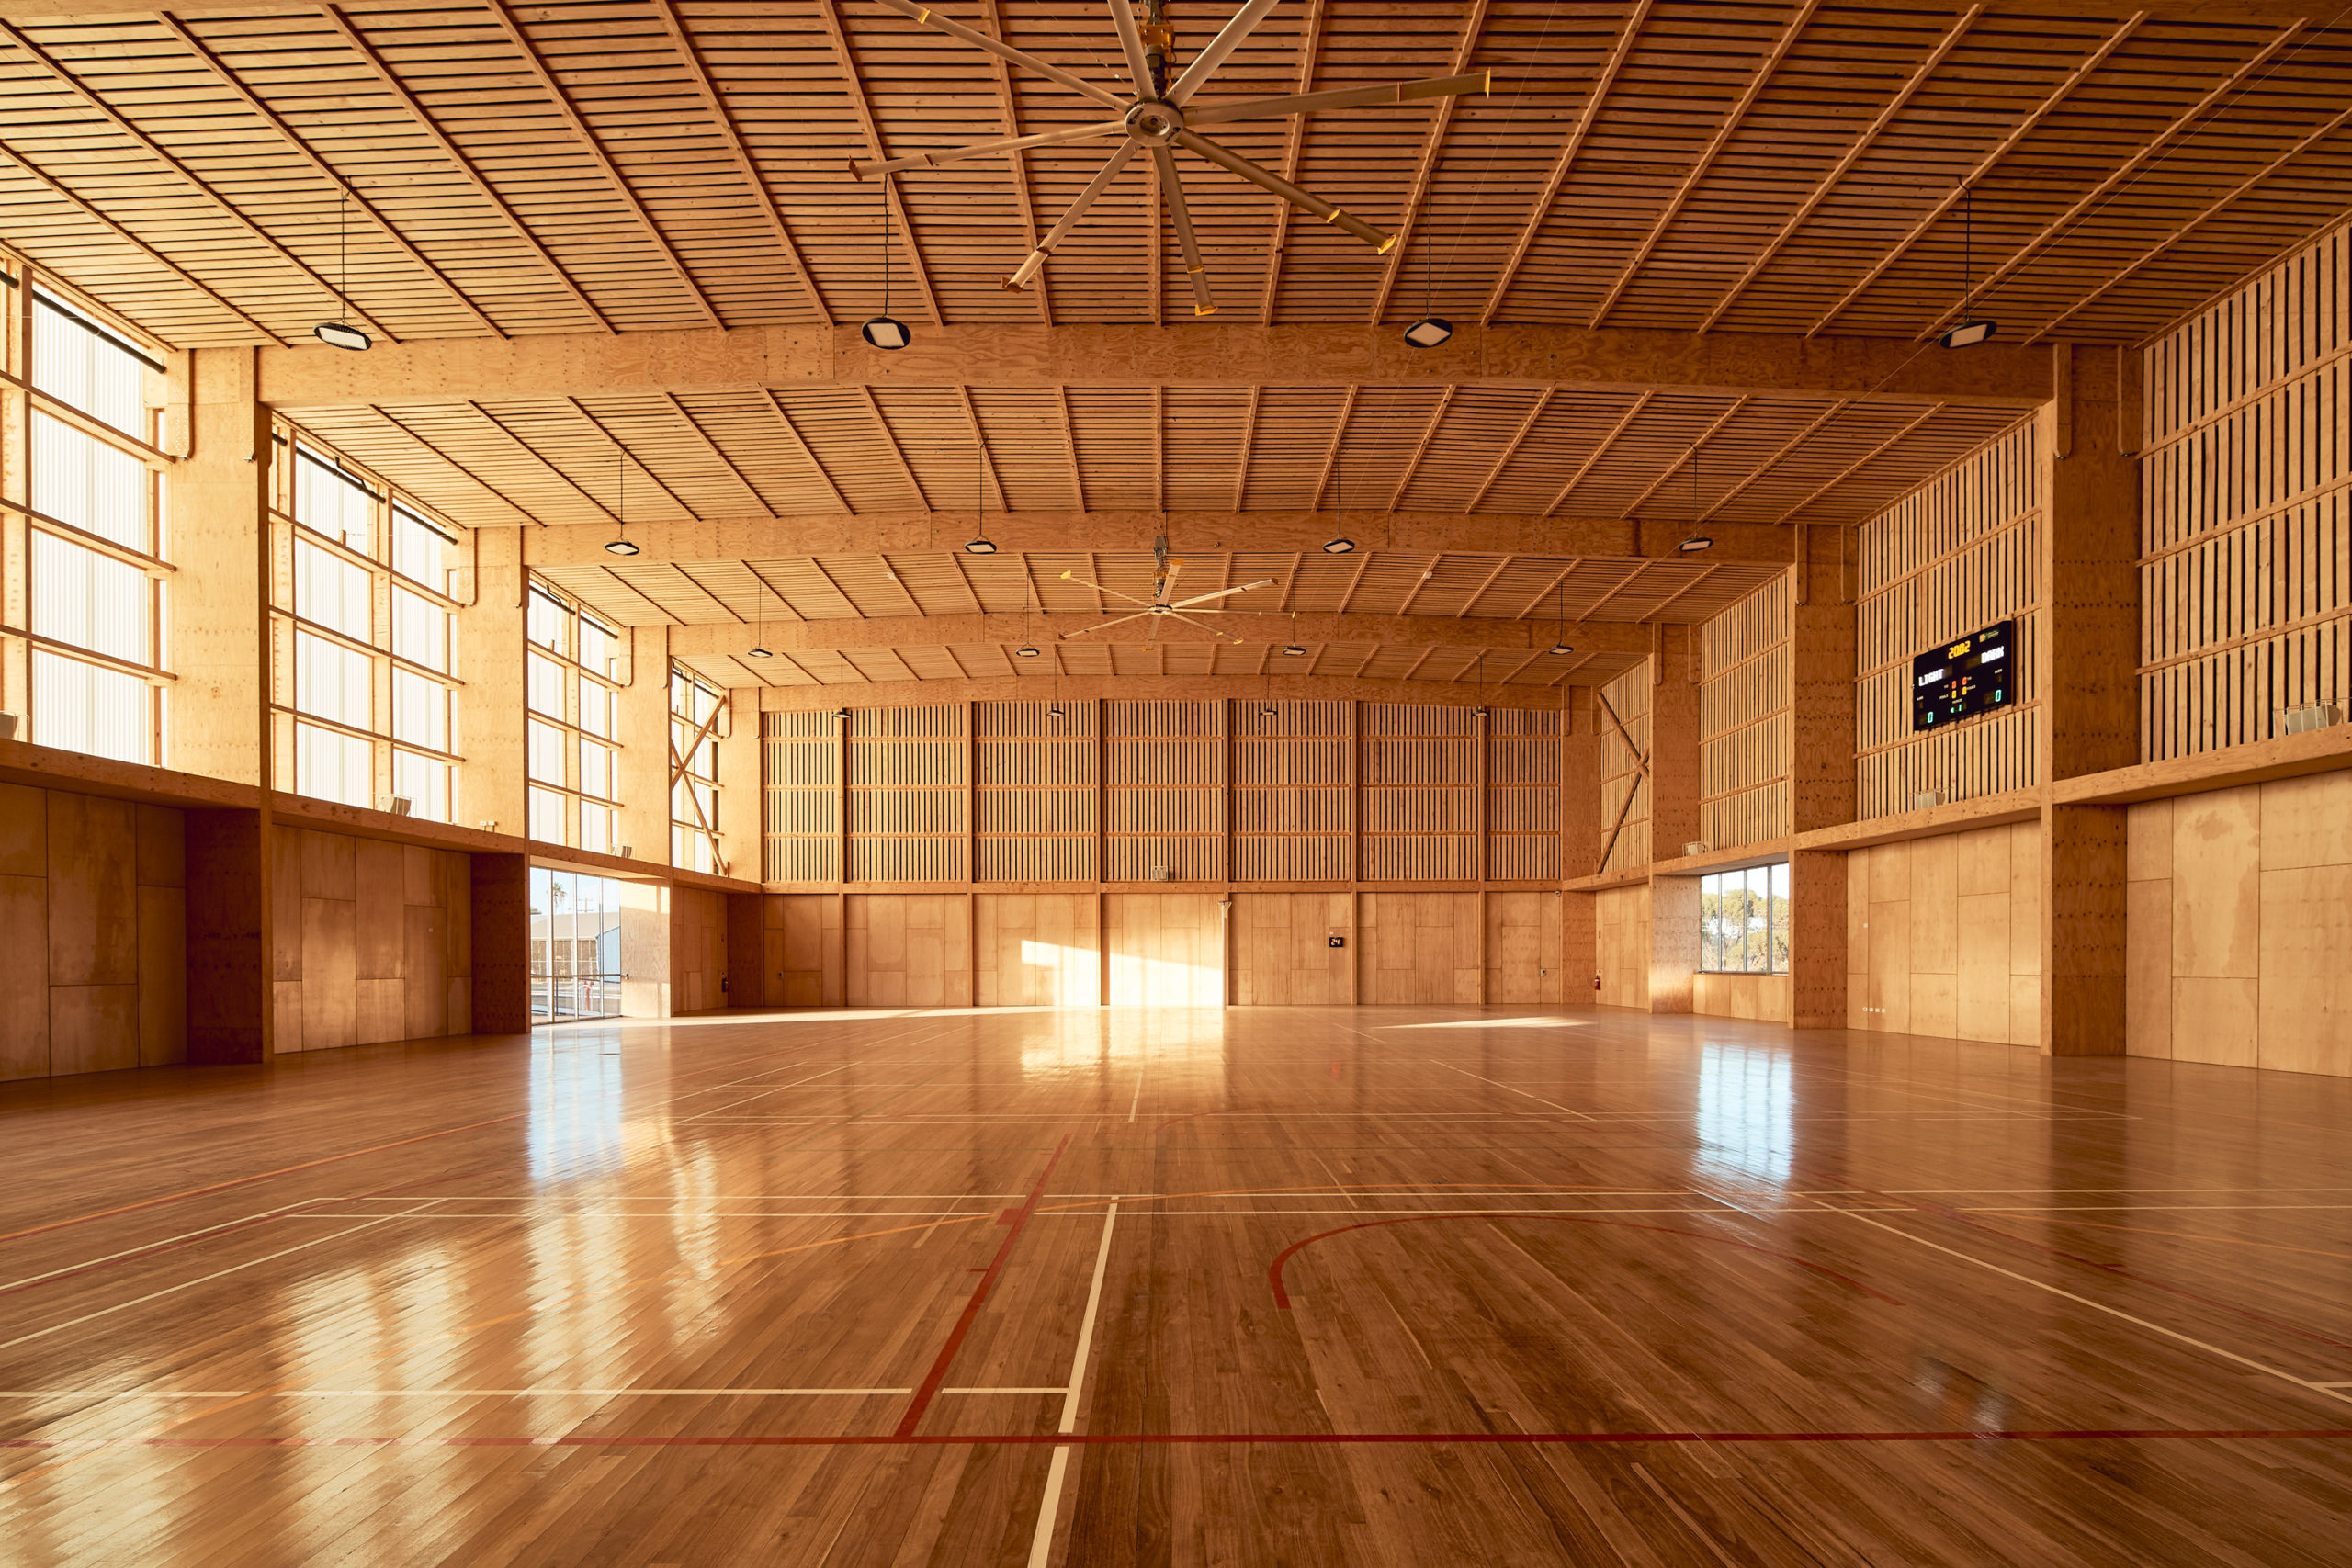 Les stades cultes Pingelly Recreation and Cultural Center par Iredale Pedersen Hook Architects avec ATC Studio, Pingelly, Australie